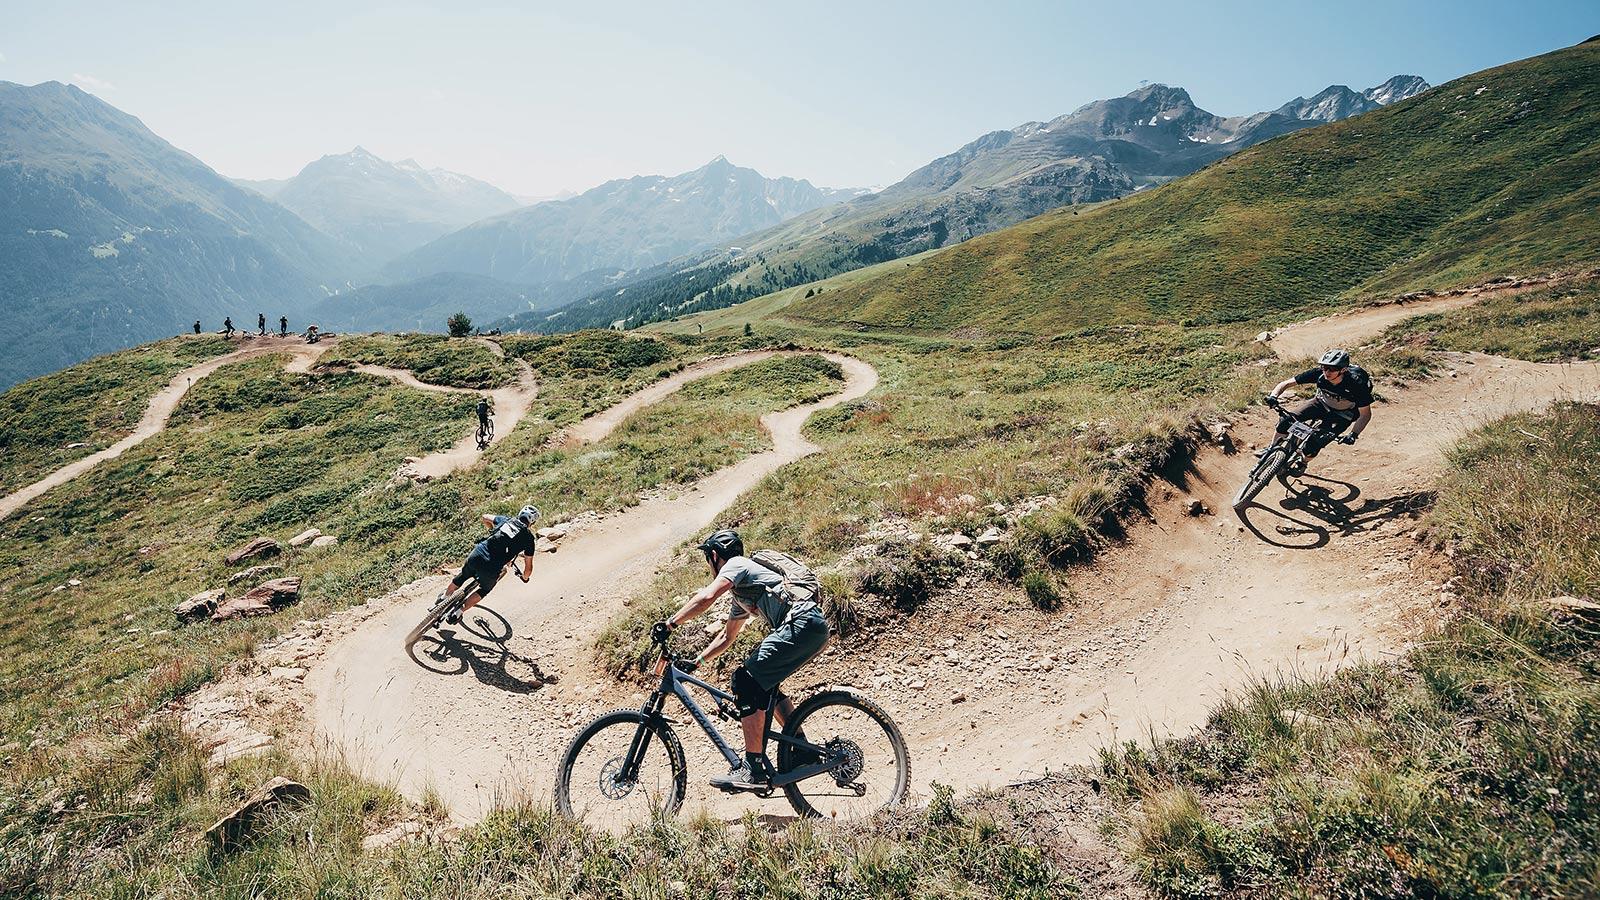 Event Schnitzeljagd 2021 Sölden Ötztal - Trailsurfing - Event